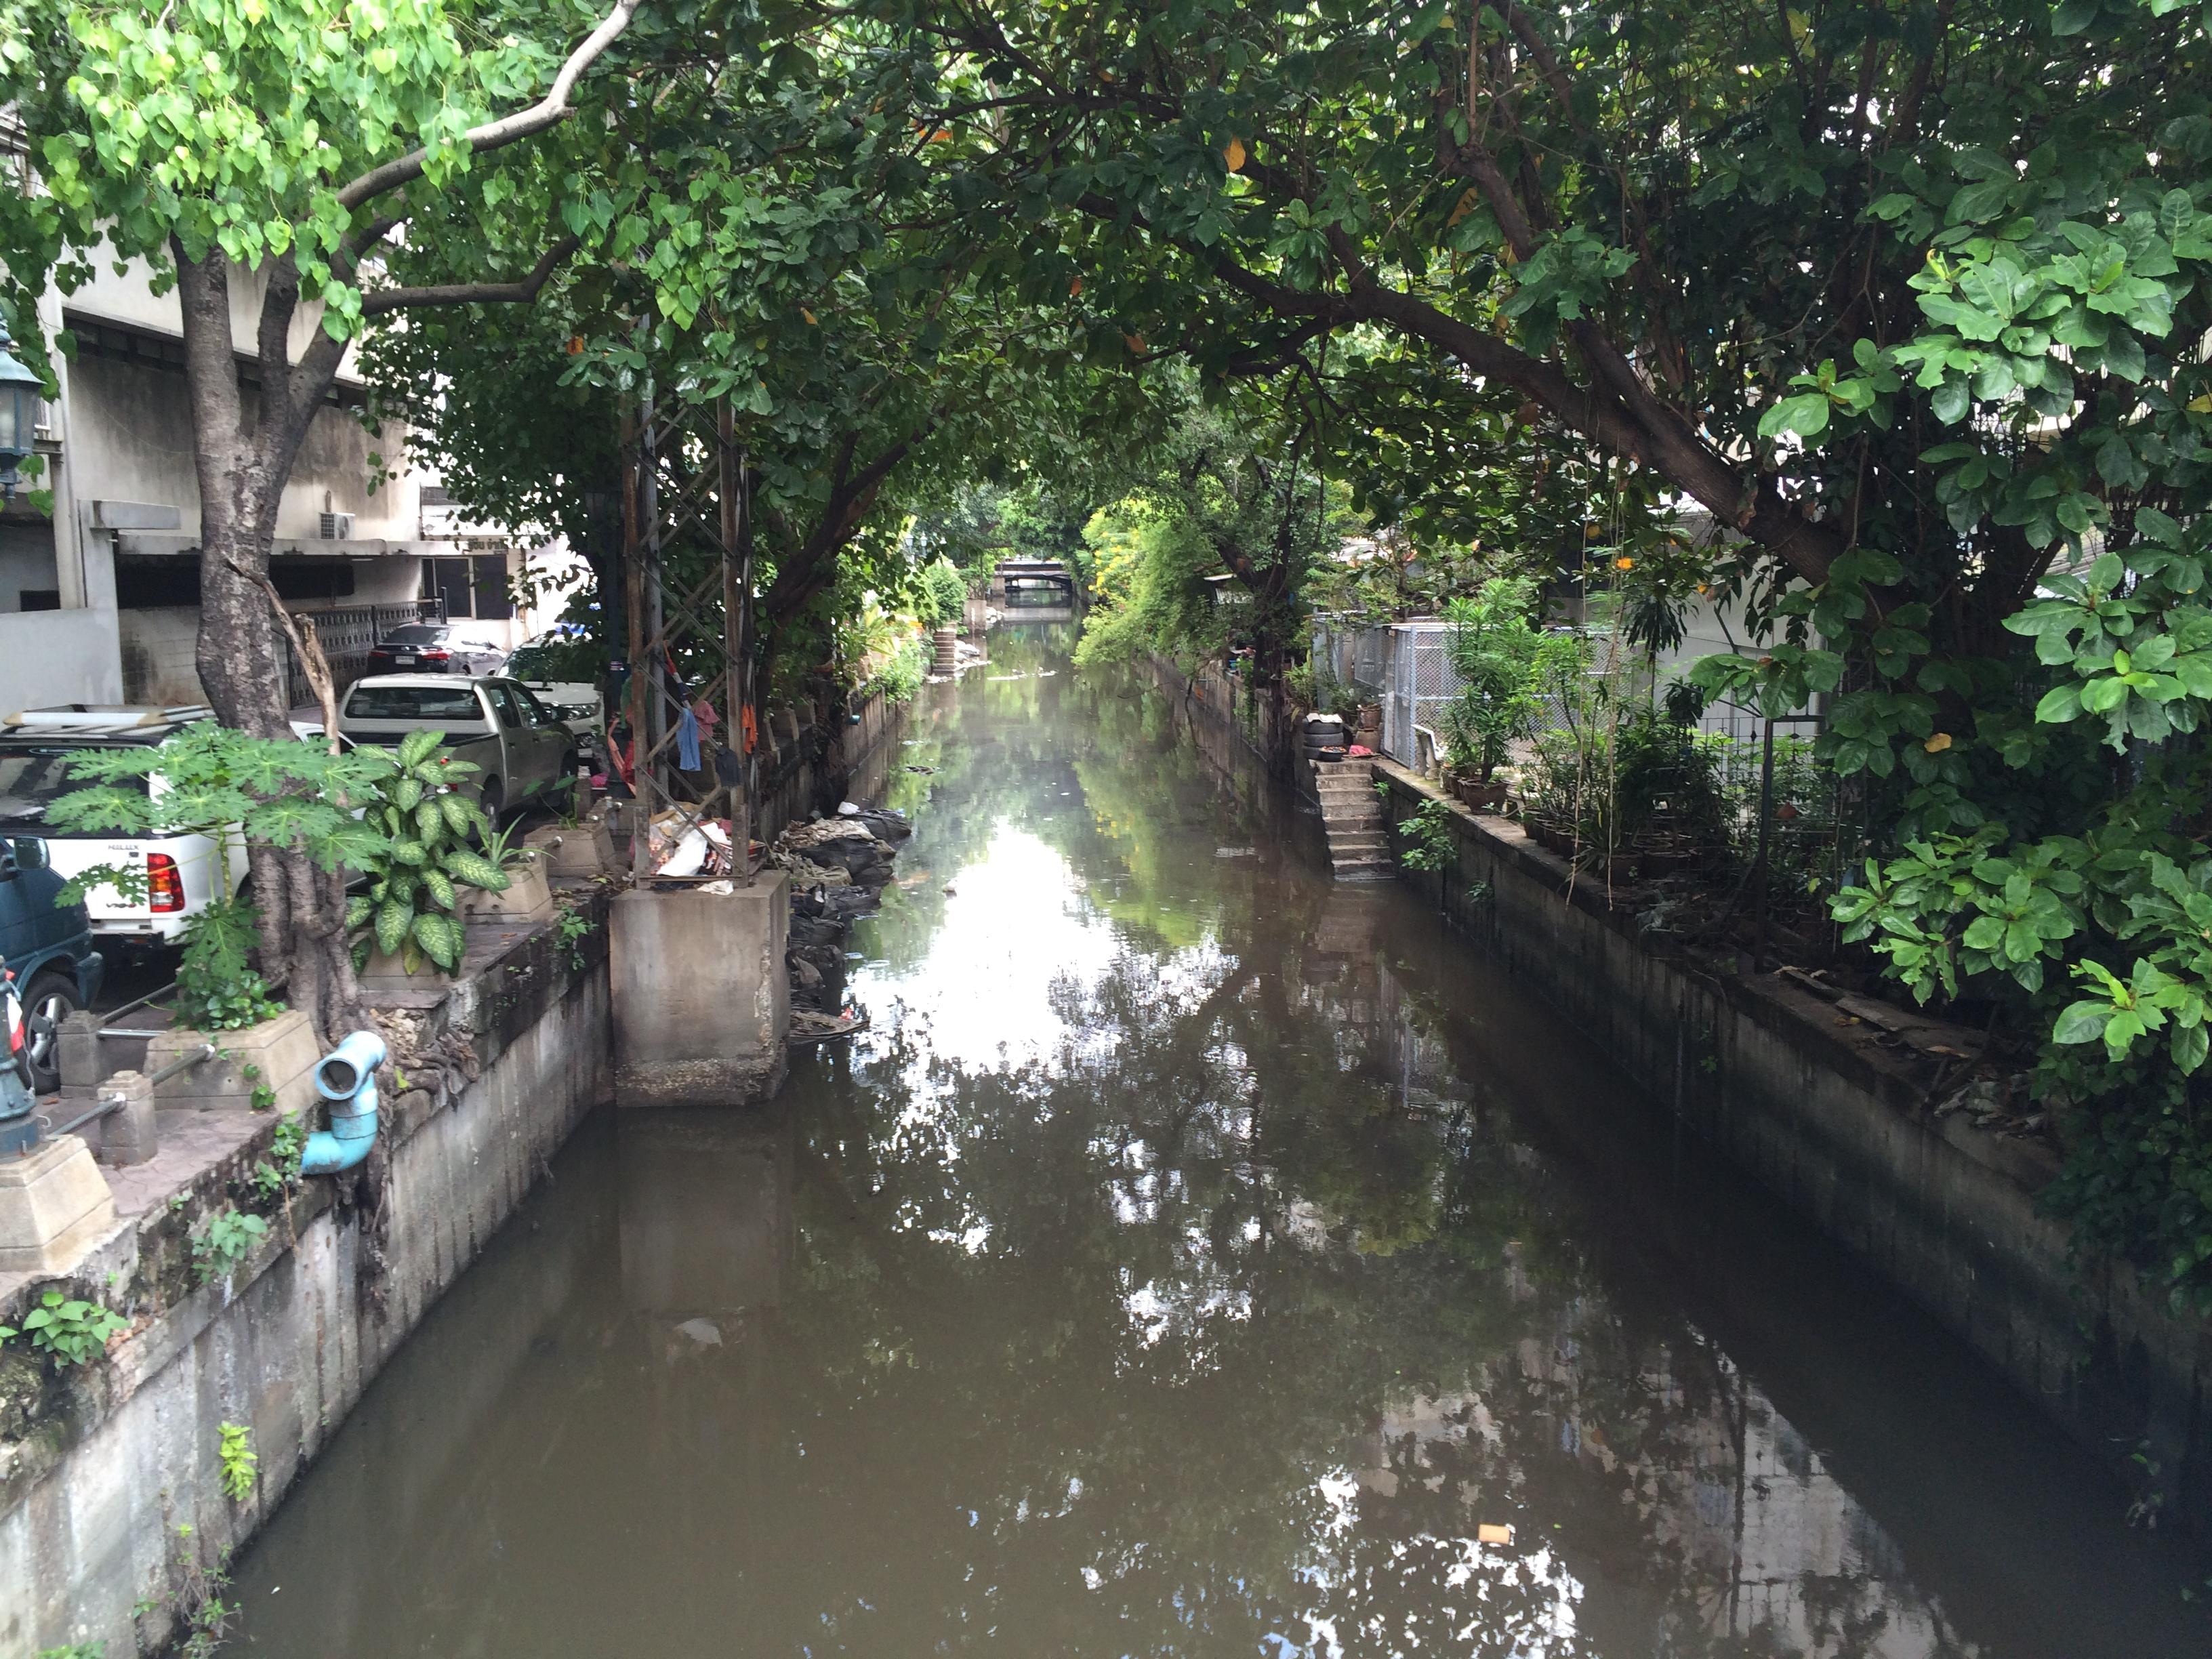 File:Bangkok Khlong Rop Mueang canal from charoen krung ...